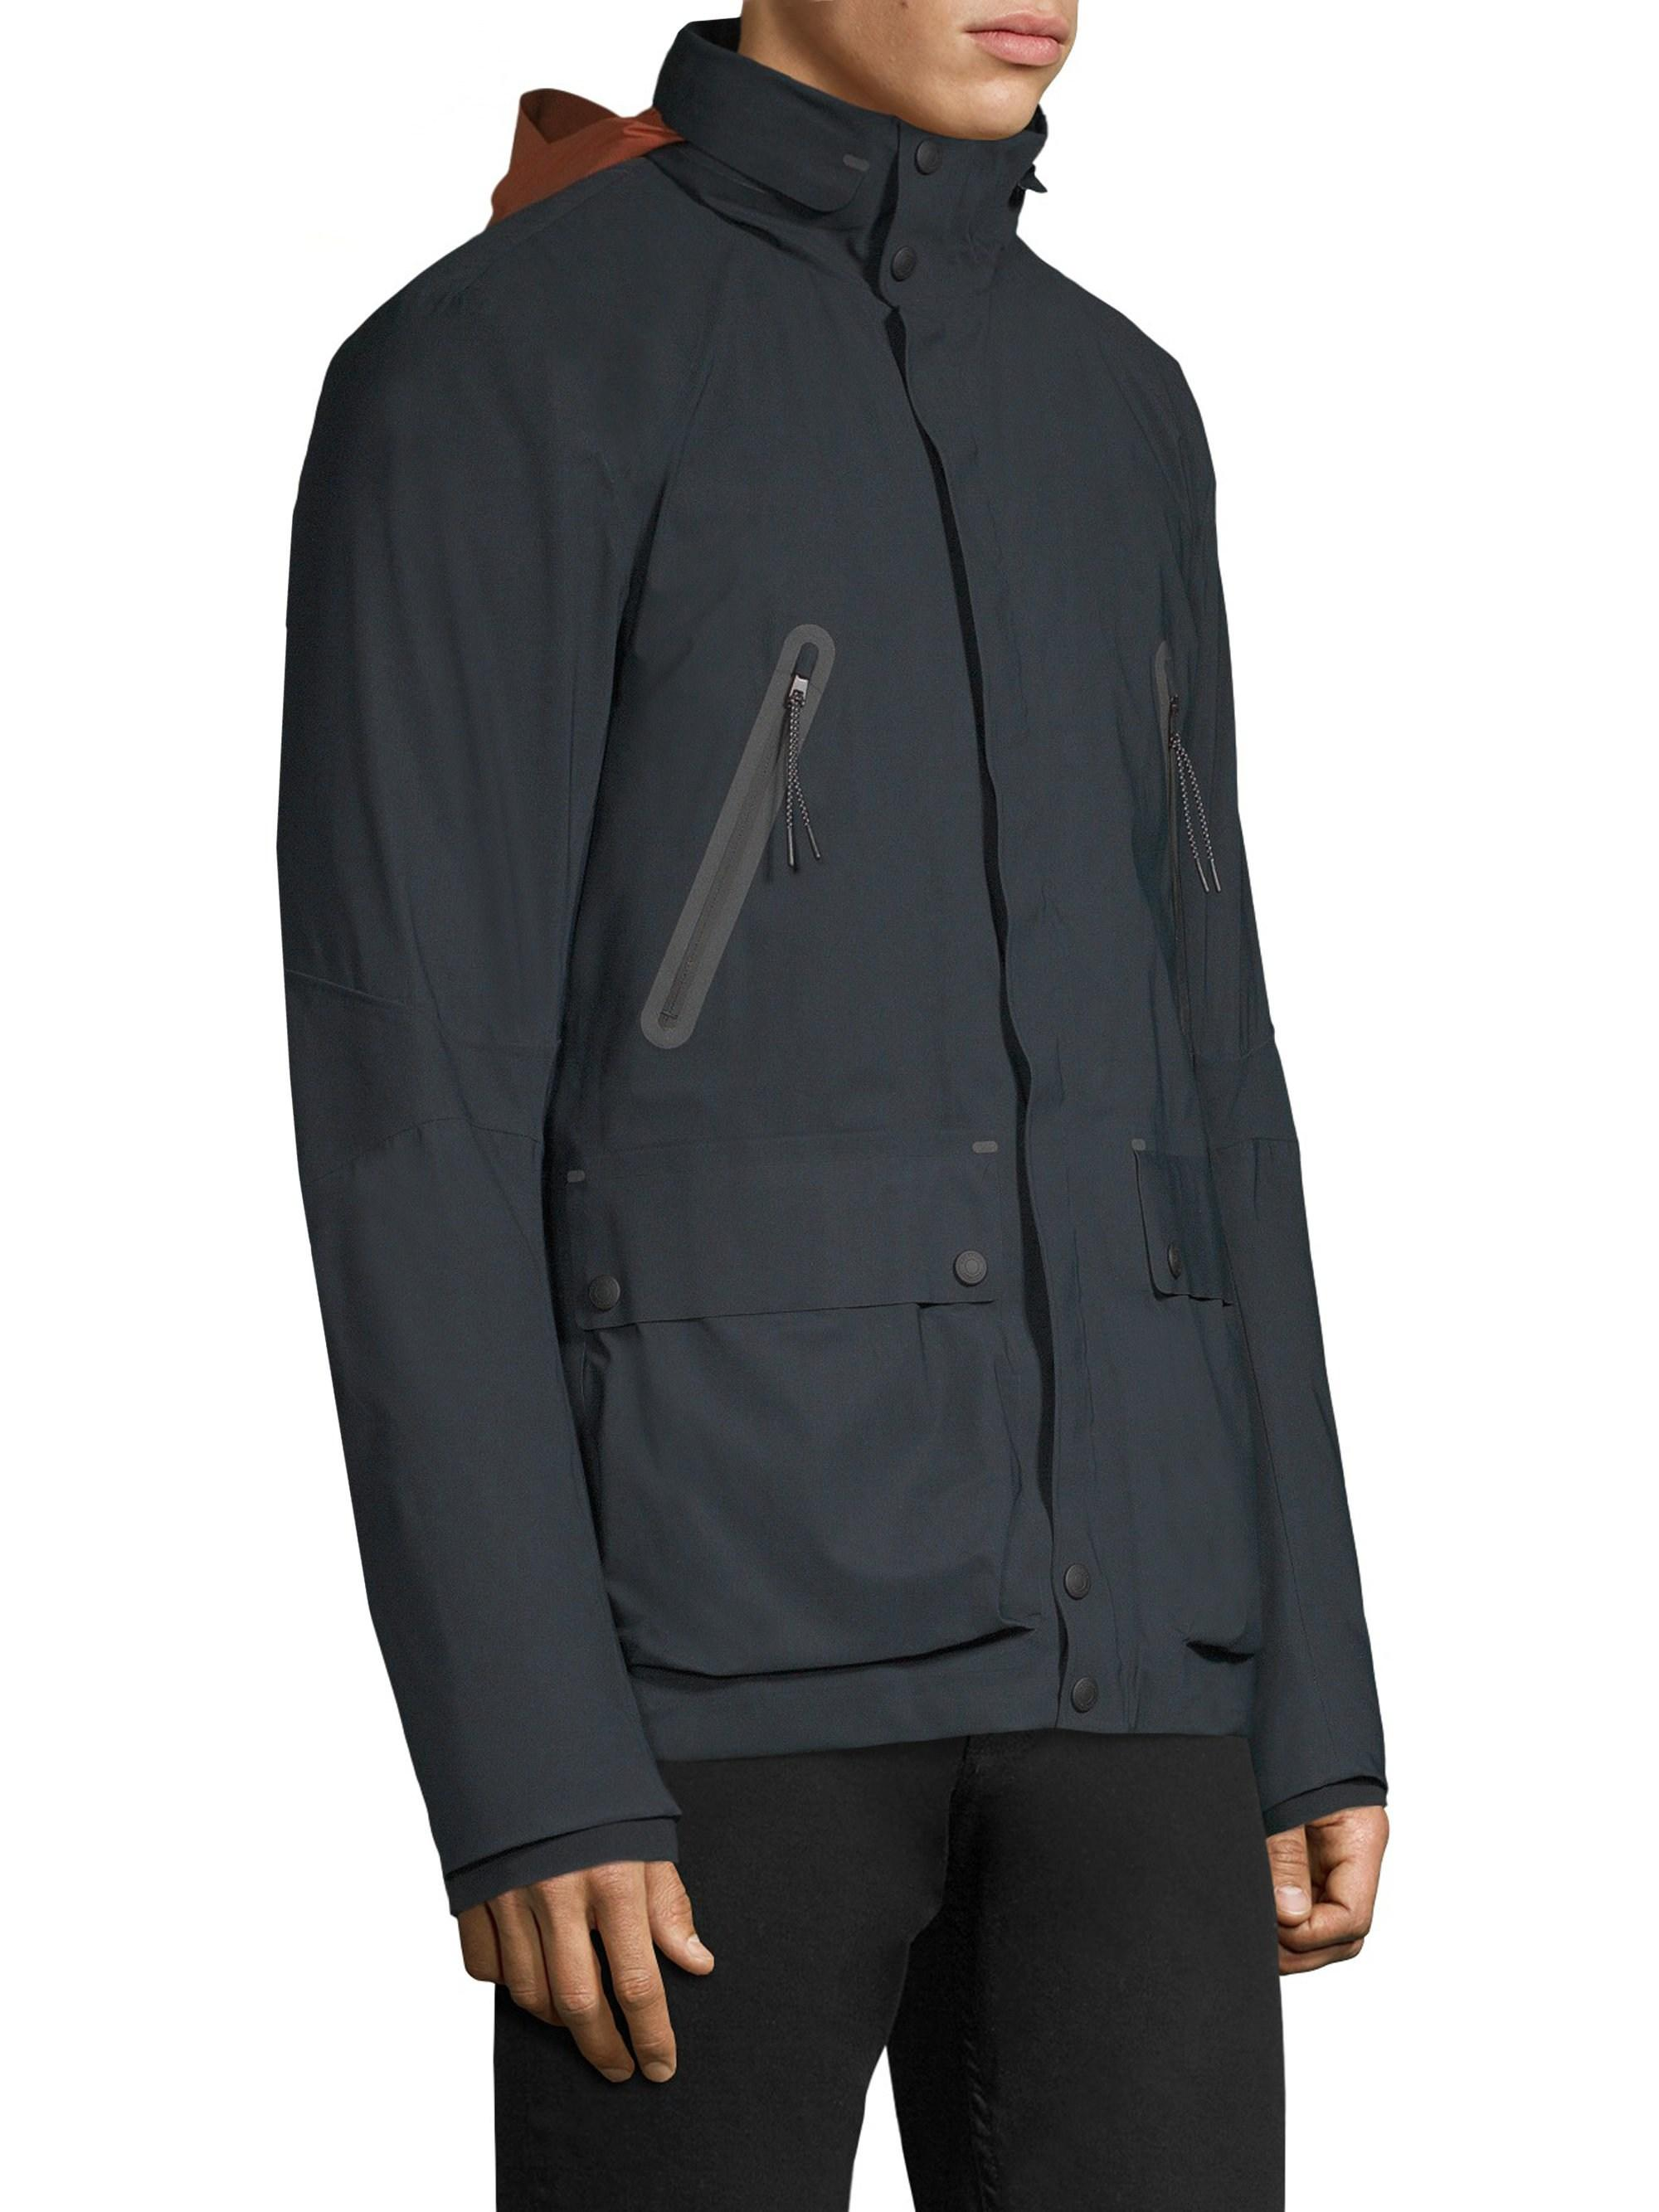 Continental Mendicidad Pacífico  Belstaff Synthetic Jetstream Zip Coat in Navy (Blue) for Men - Lyst